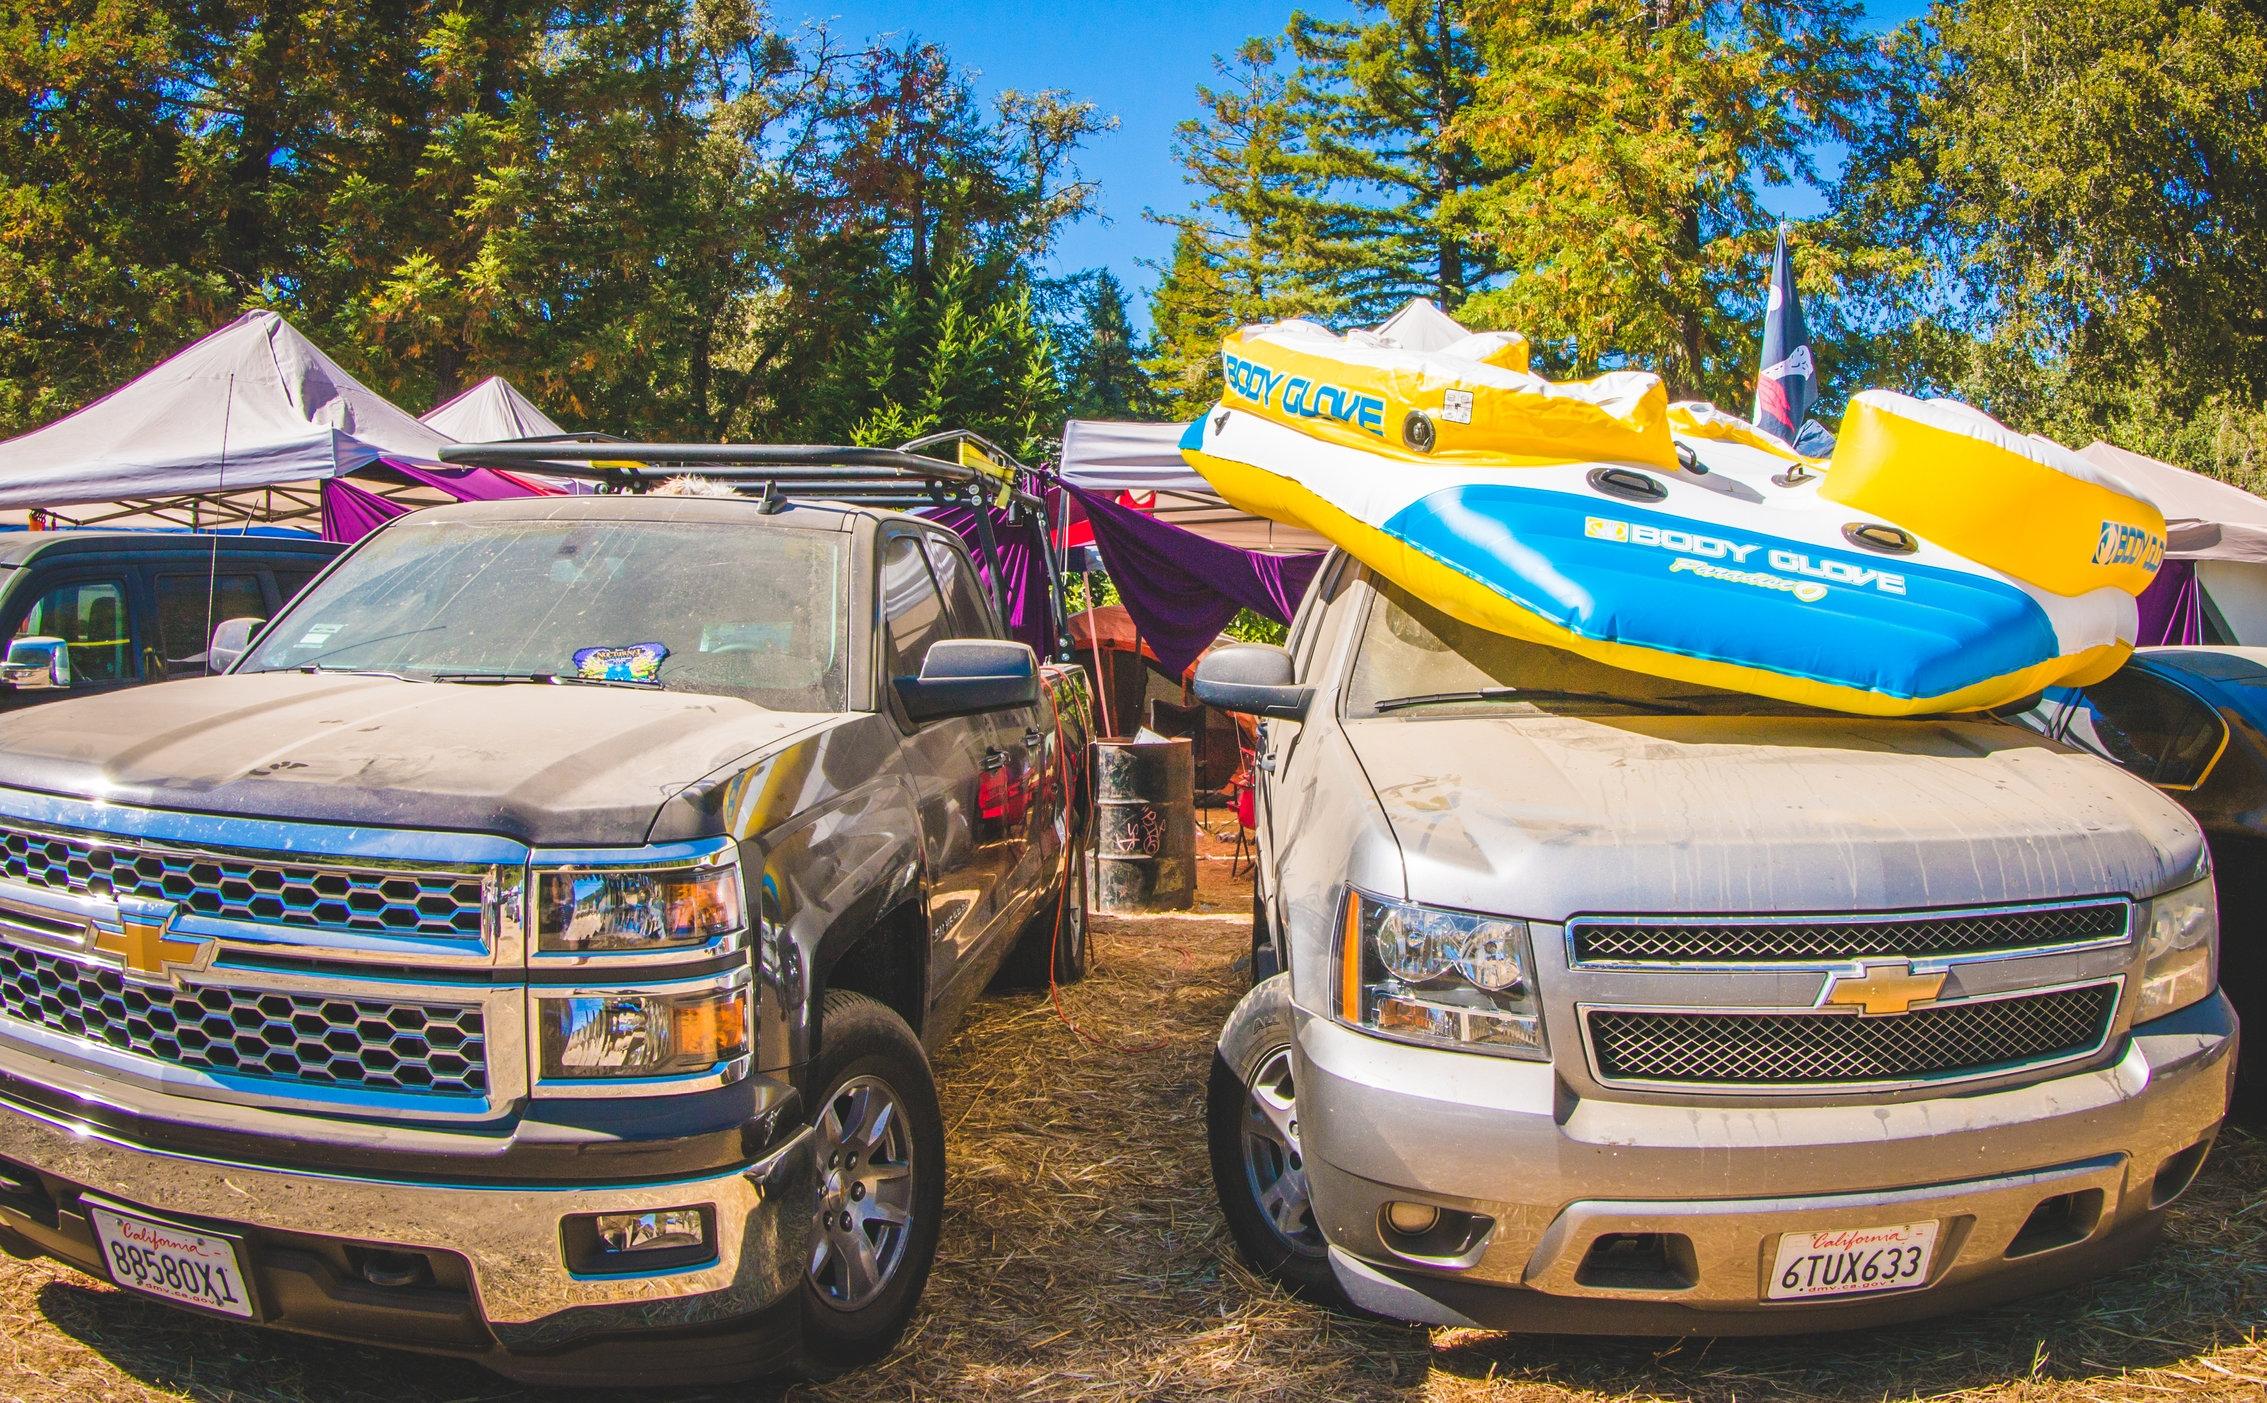 4x4camping-festival.jpg